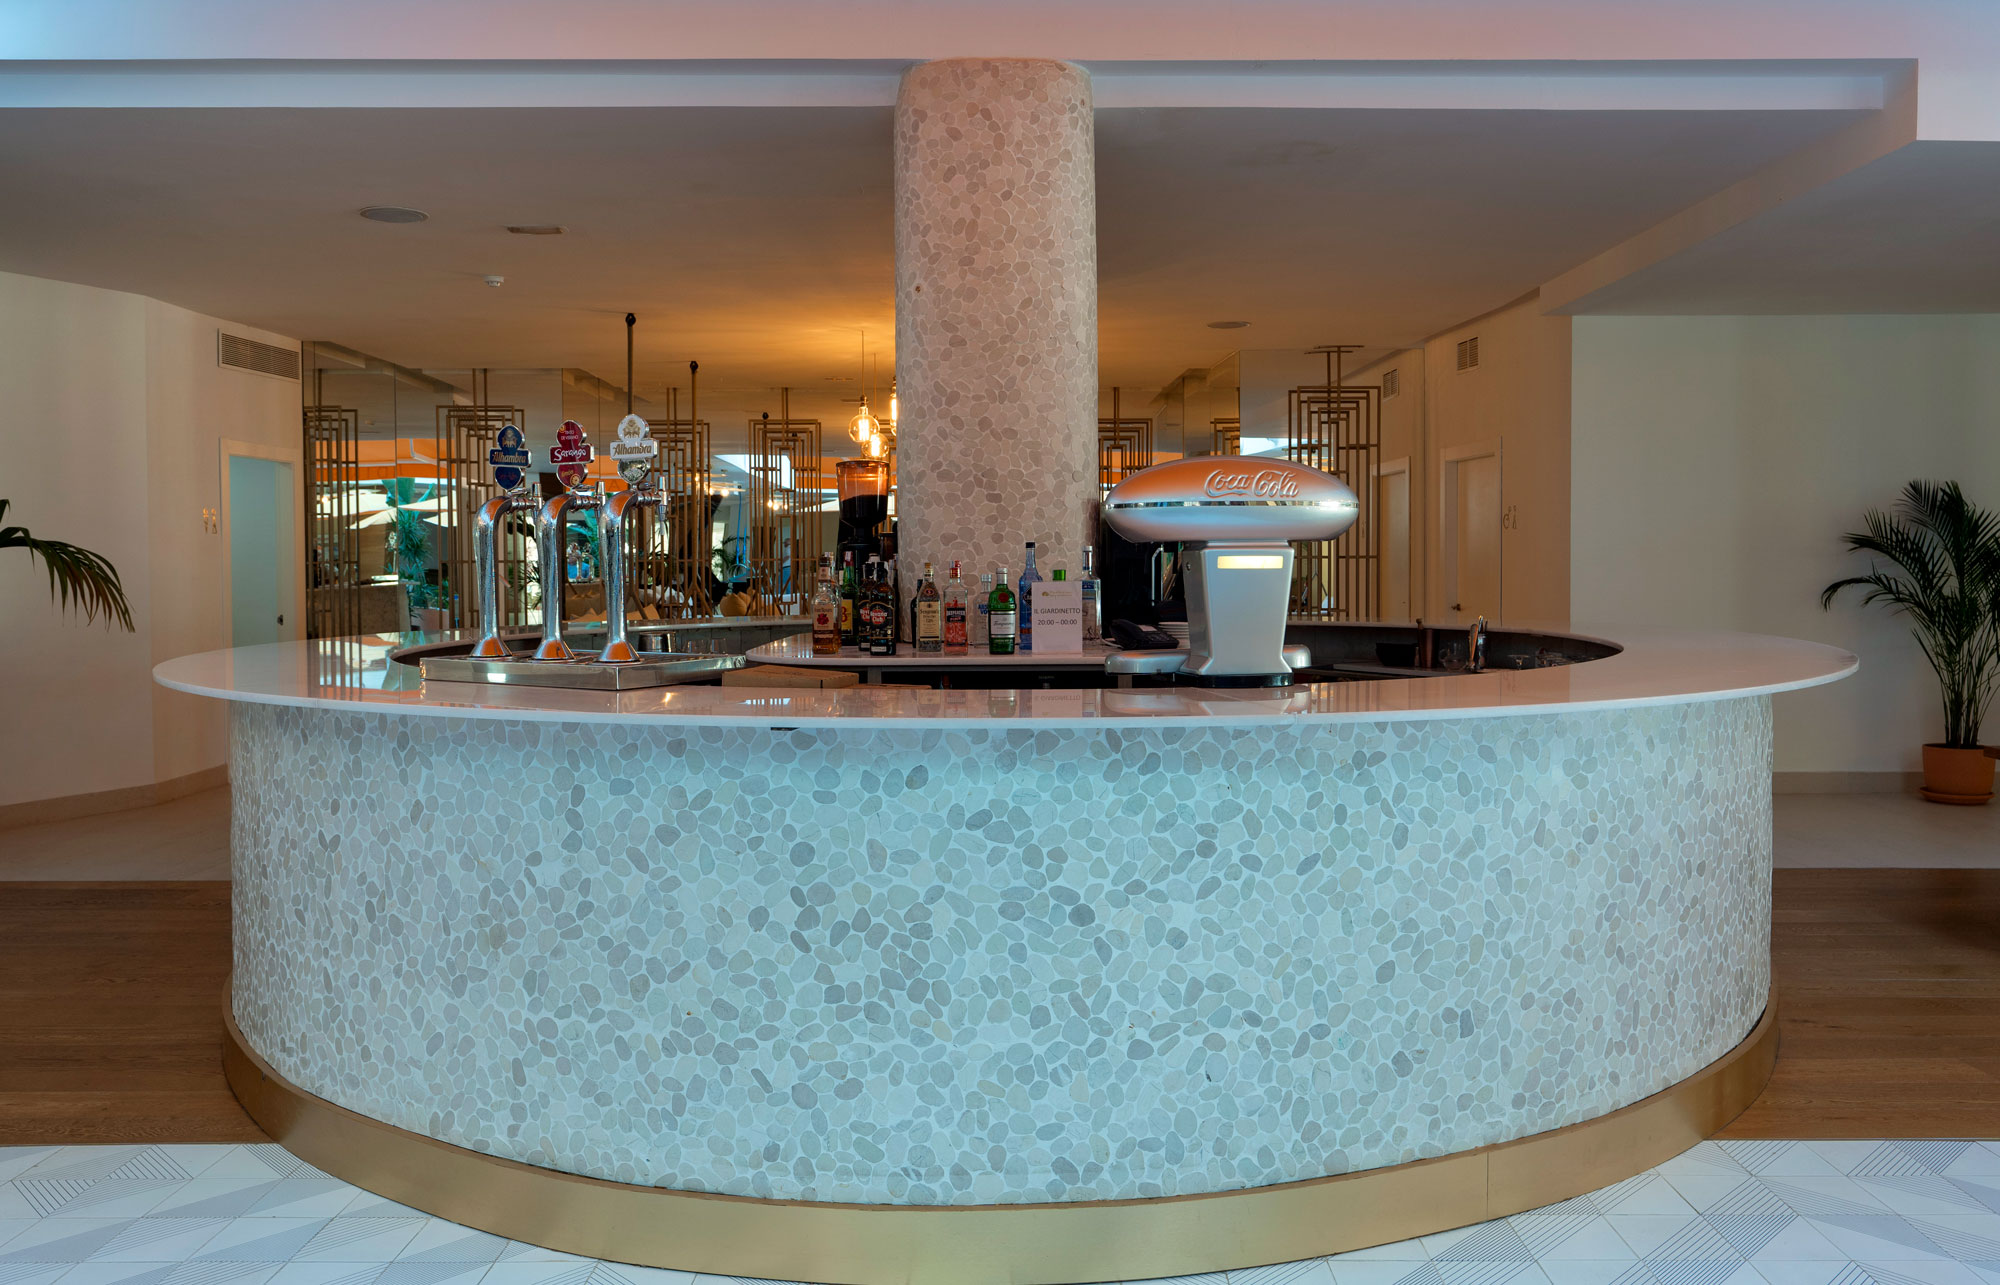 Hotel Mediterráneo  - Hotel Mediterraneo Park 13 Dekton Silestone Piedra Natural Cosentino 57